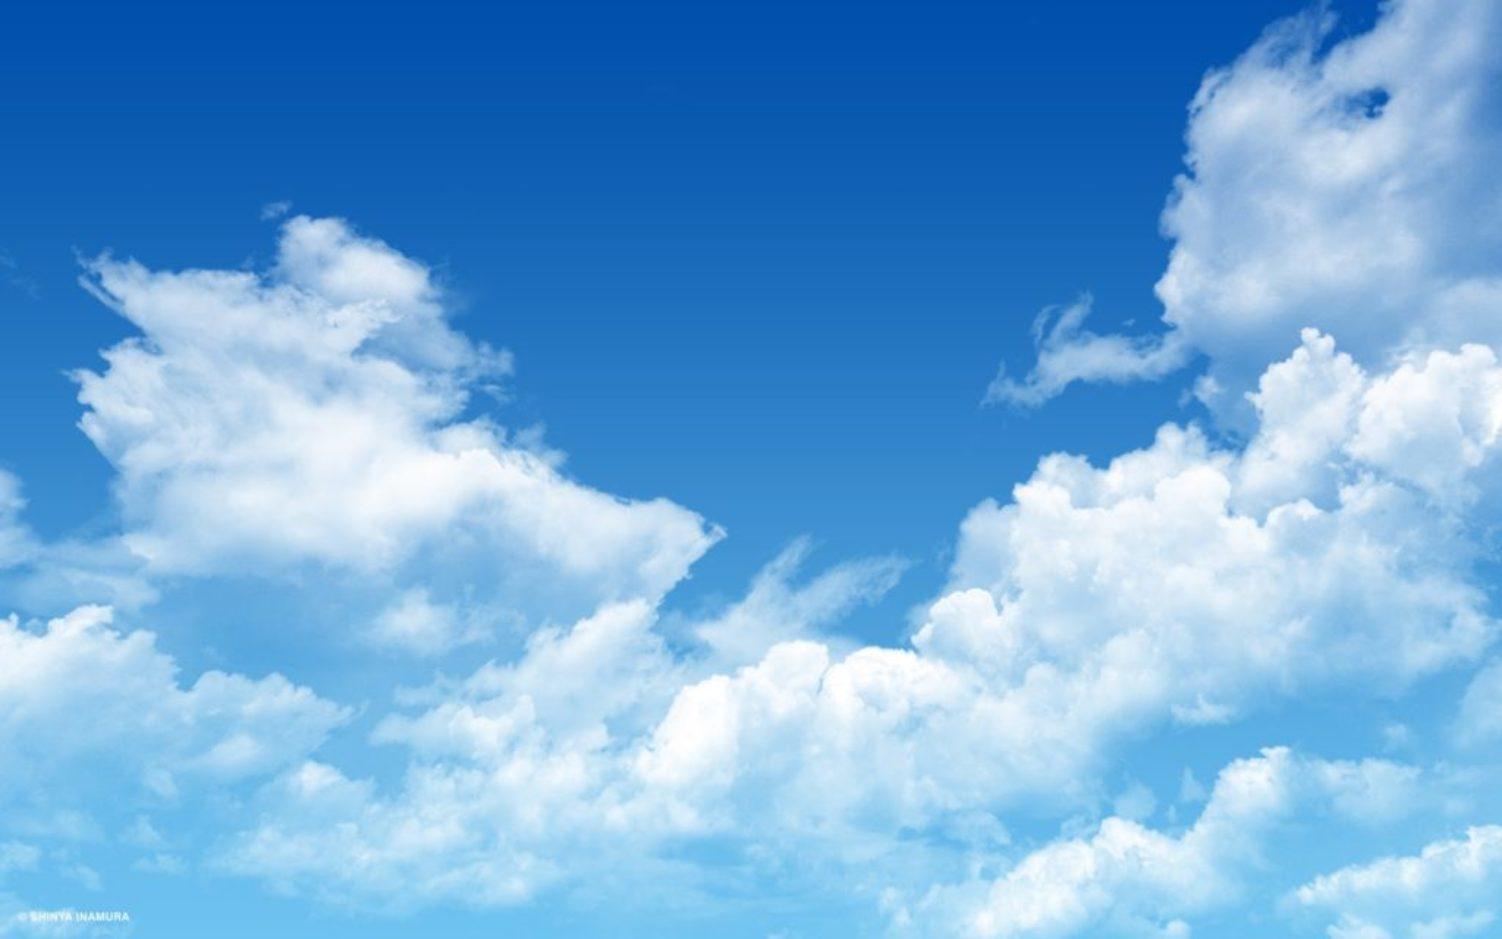 sky wallpaper 1080p For Desktop Wallpaper1